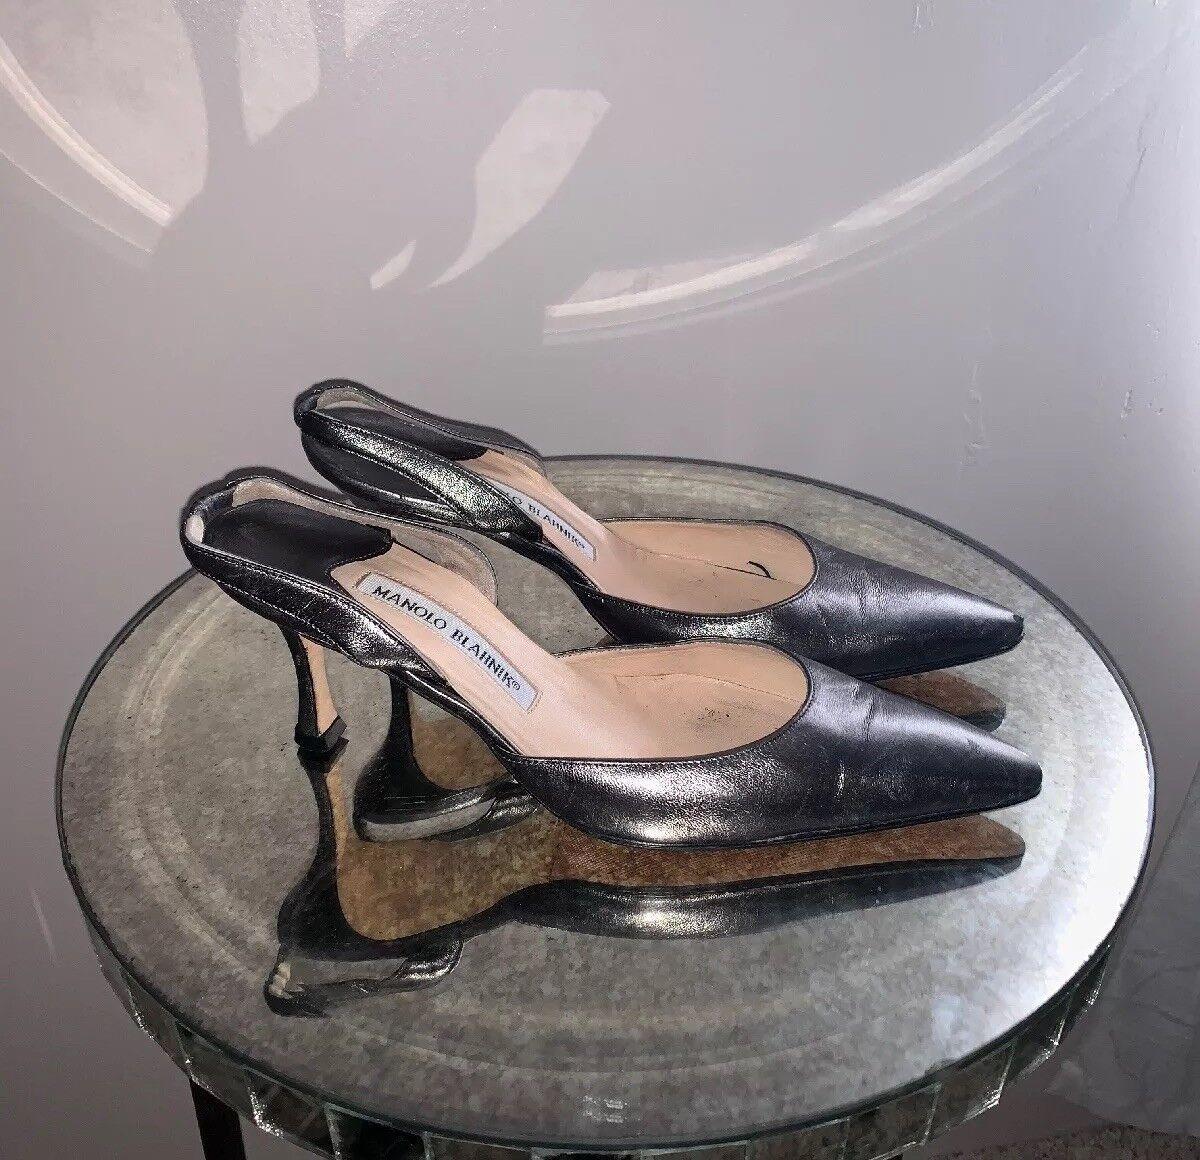 Manolo Blahnik Carolyne Pewter Leder  slingback slingback slingback heels 36 1/2 4c93fb